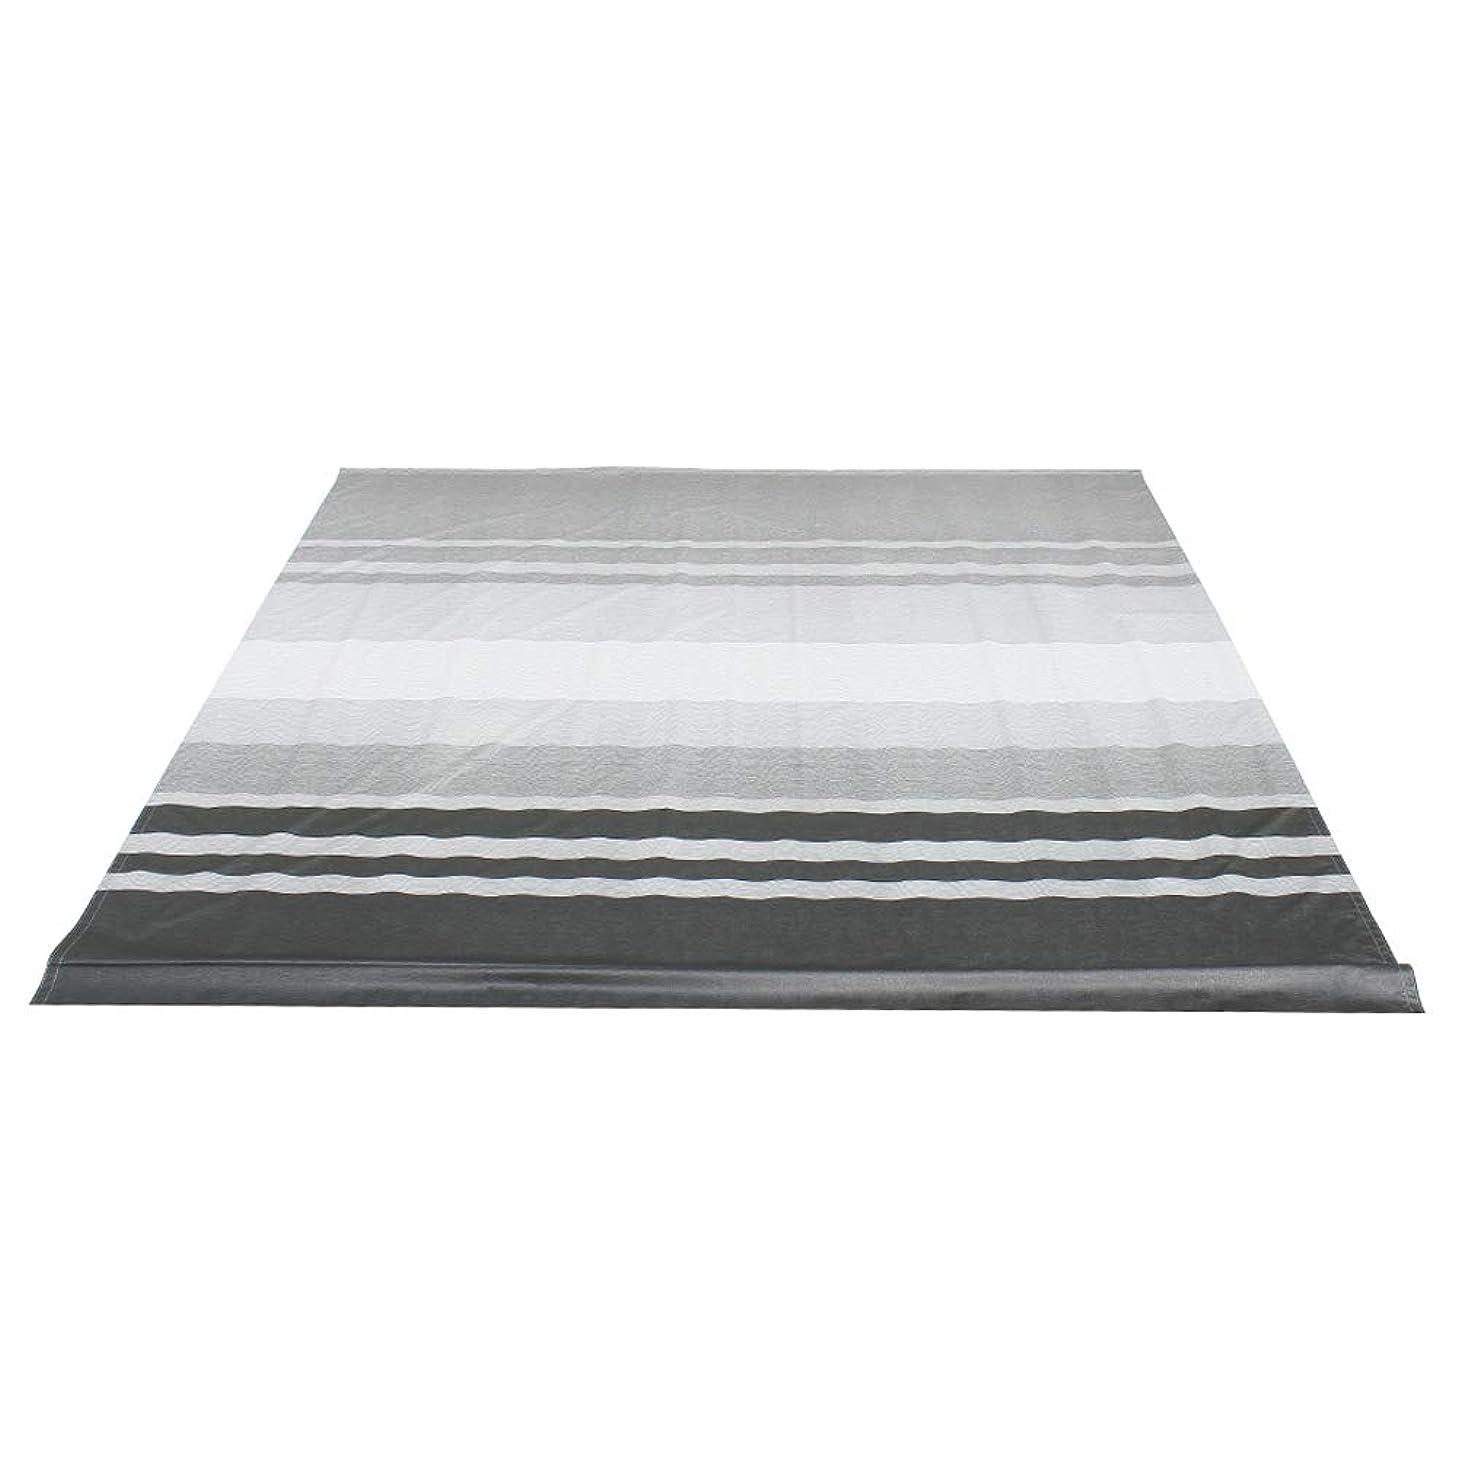 ALEKO RVFAB12X8BLKST33 RV Awning Fabric Replacement 12 x 8 Feet Black Striped